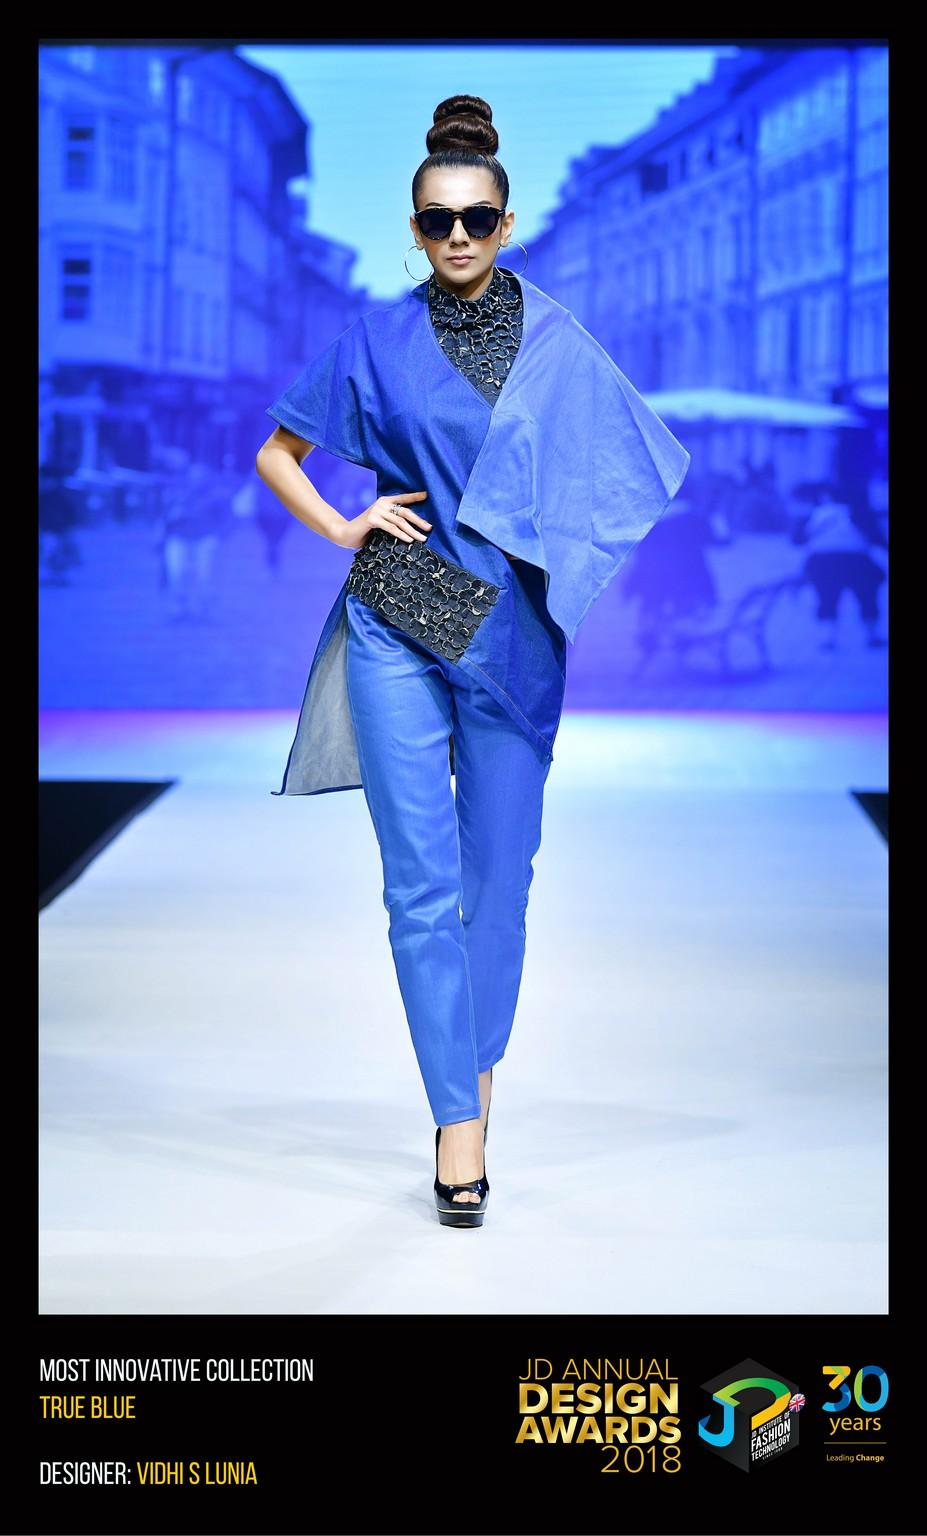 True Blue – Change – JD Annual Design Awards 2018 | Designer: Vidhi Lunia (ADFD 2015) | Photography : Jerin Nath (@jerin_nath) true blue - True Blue Photos JDW FB1 - True Blue – Change – JD Annual Design Awards 2018